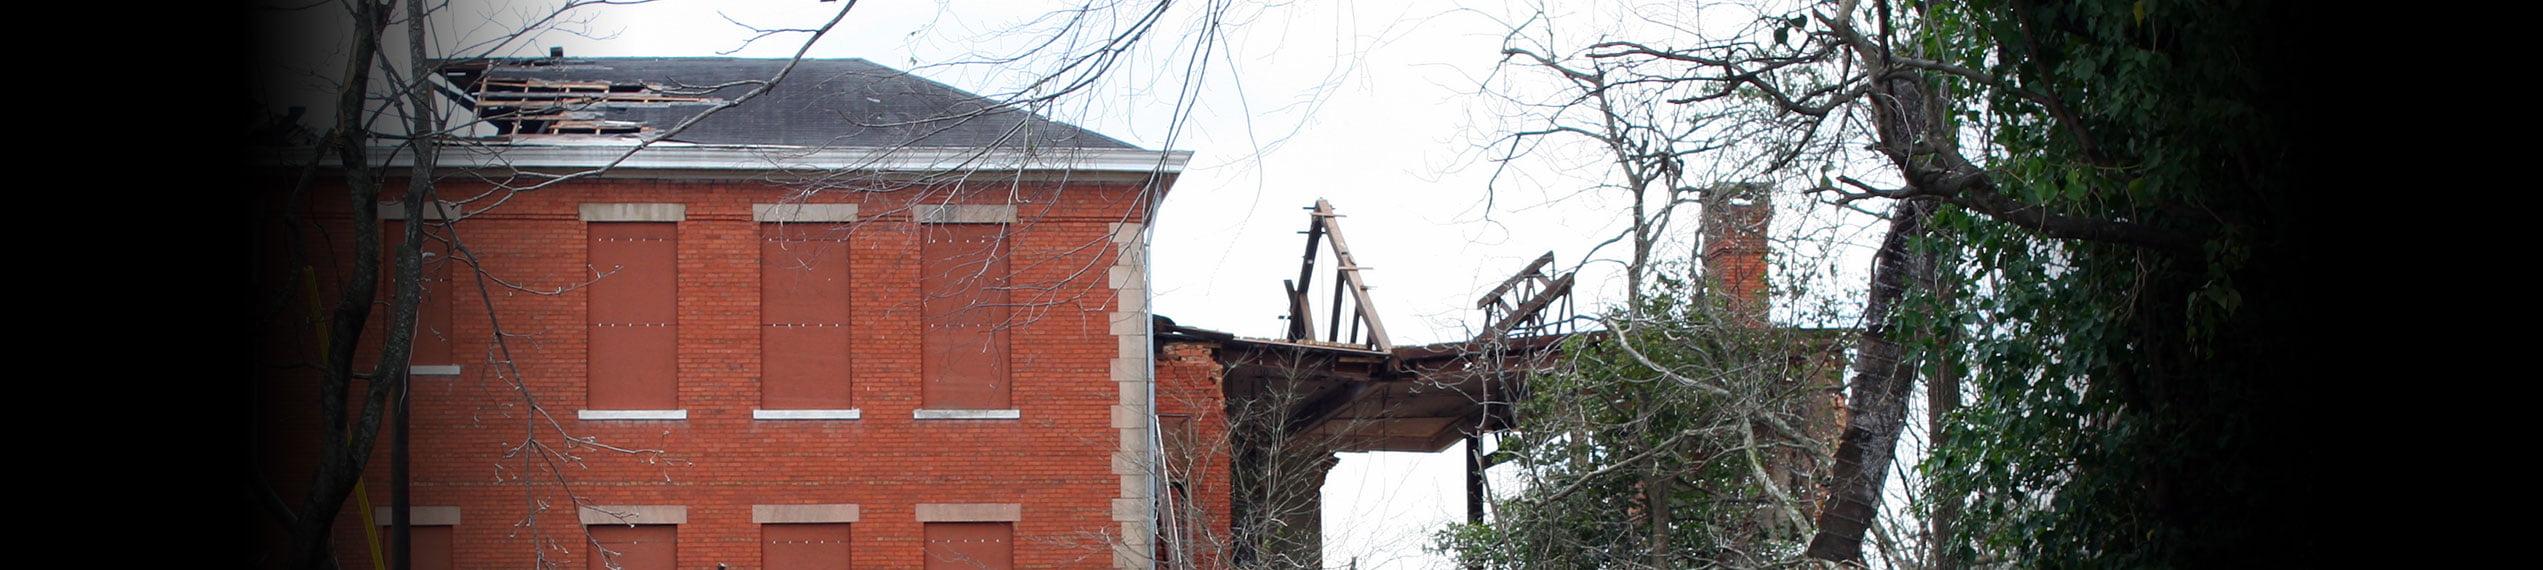 Wind & Storm Damage Repairs in Paul Davis Restoration of Northeast Georgia